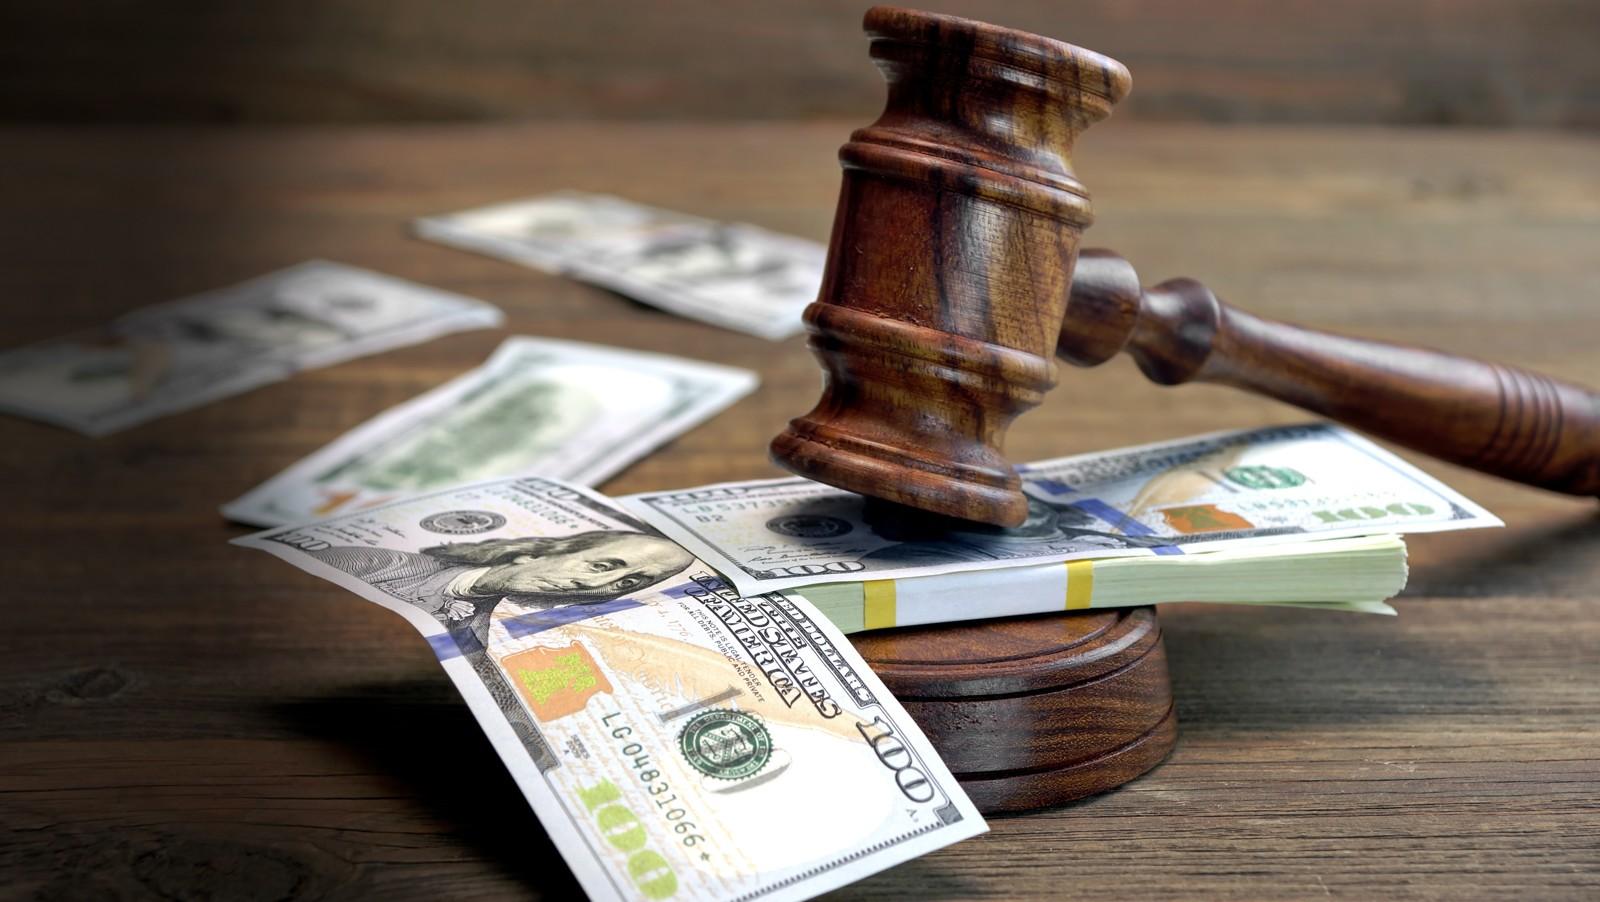 Pennsylvania regulator slaps four casino operators with $62,500 fine